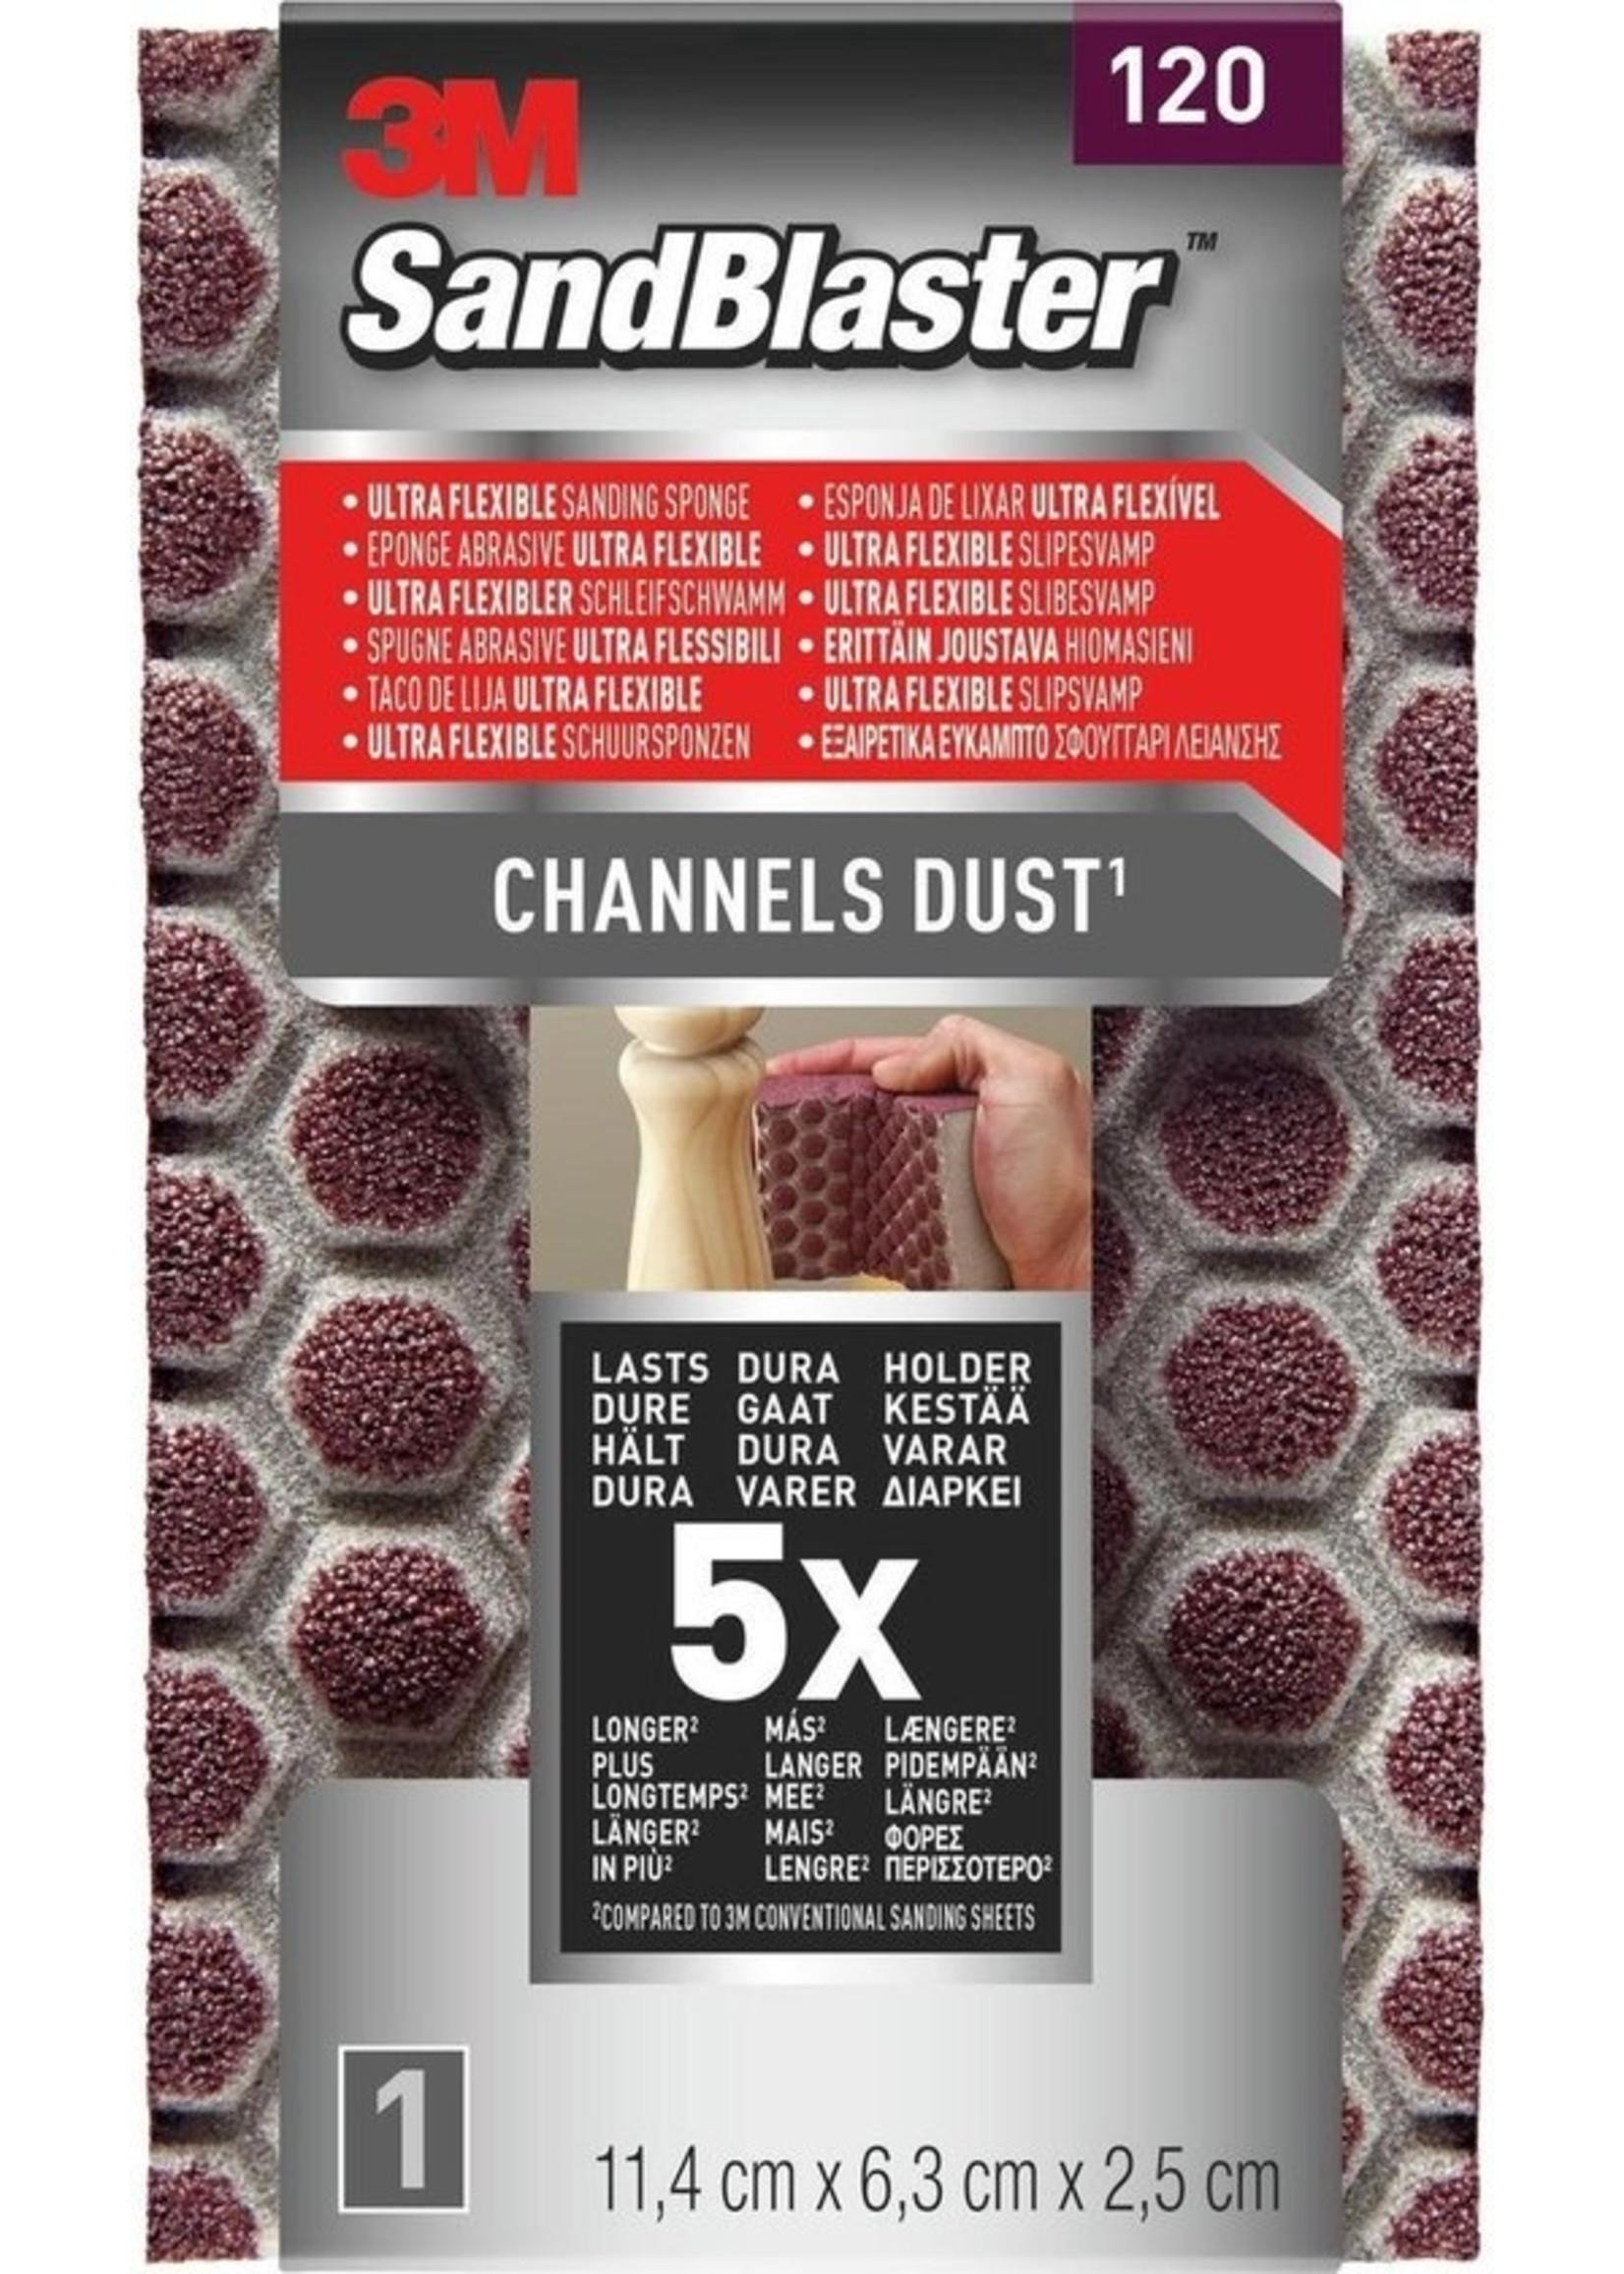 3M 3M™ SandBlaster™ Ultra Flexible Schuurspons, 9120SBE, P120, 11,4 x 6,3 x 2,5 cm,1 kaart